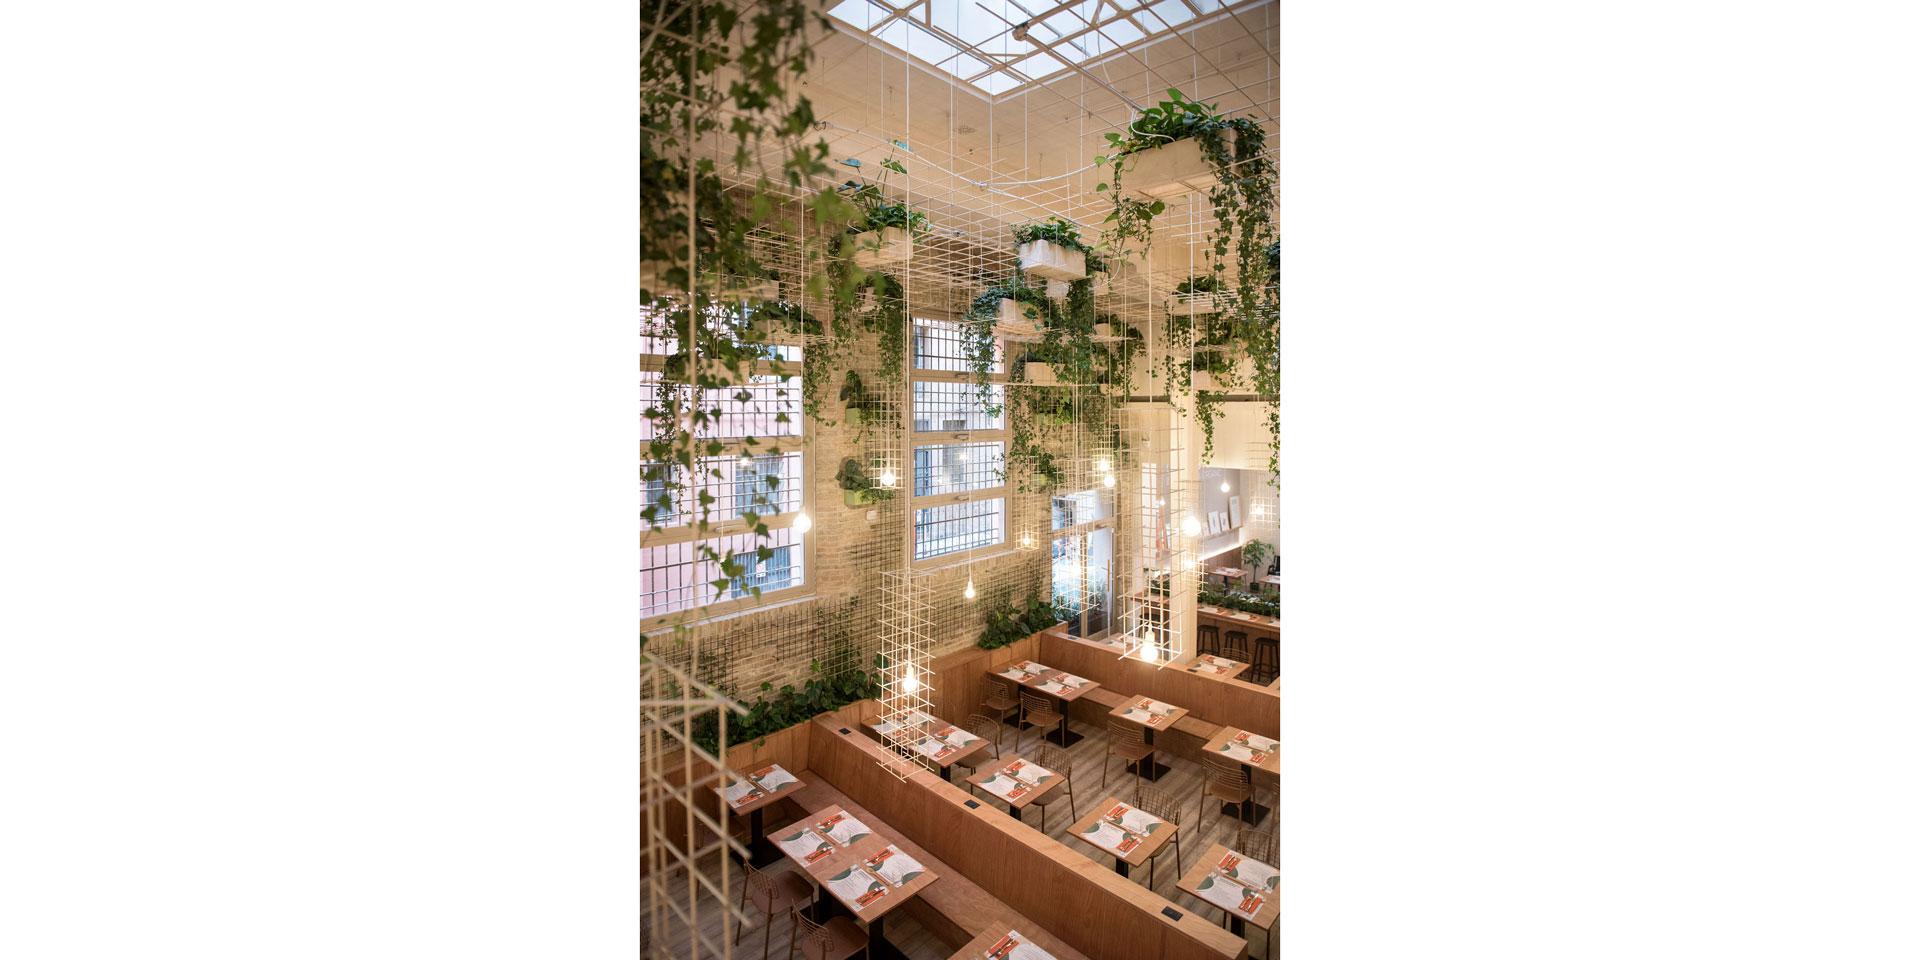 archinow_BOB_new-restaurant_19